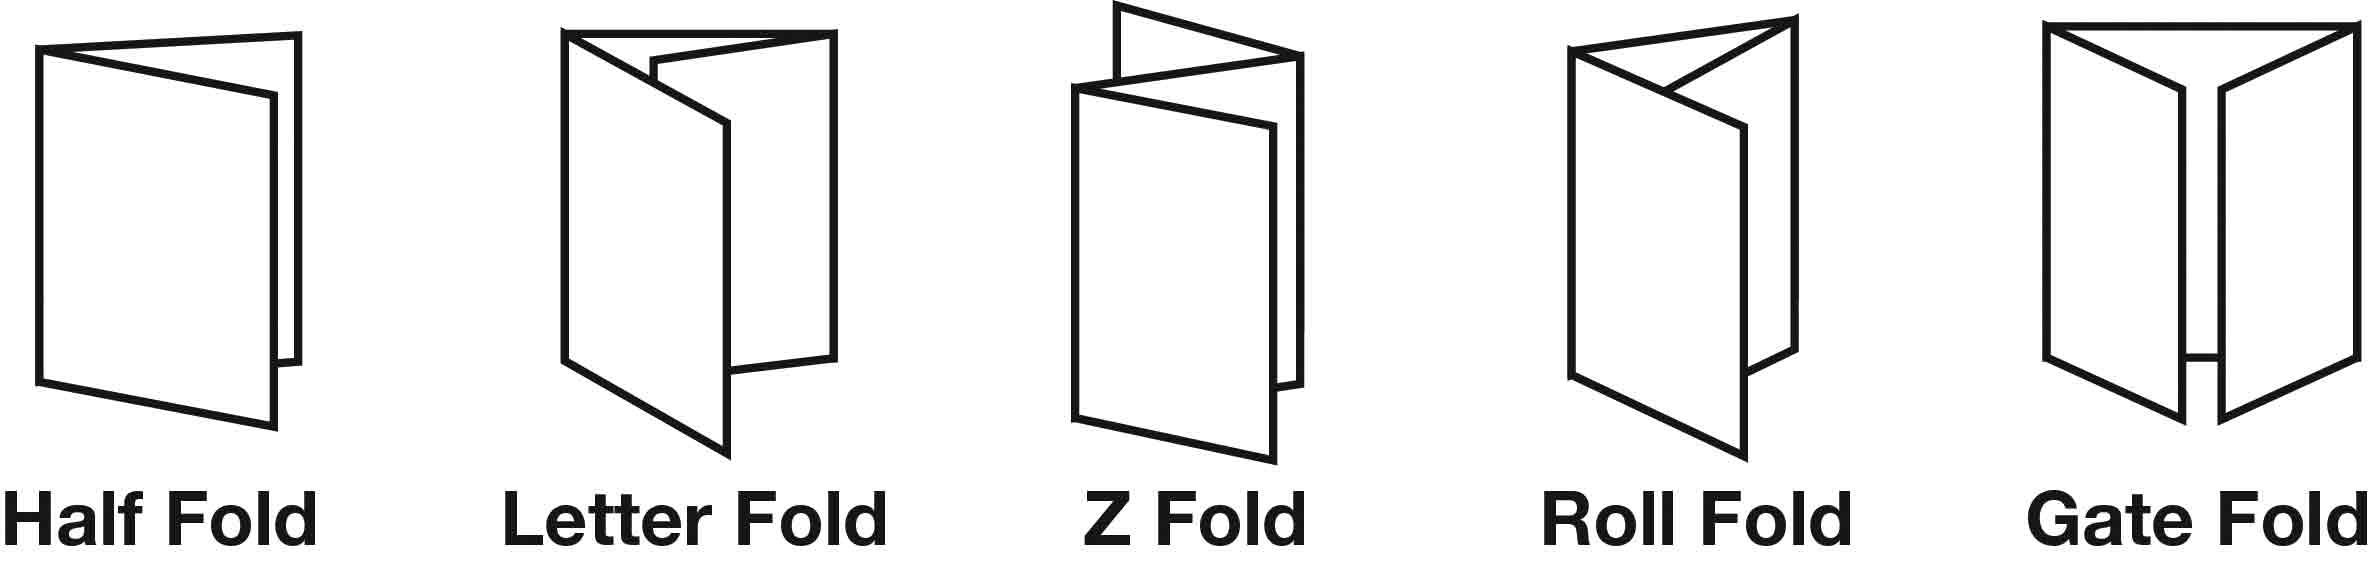 Folding Styles